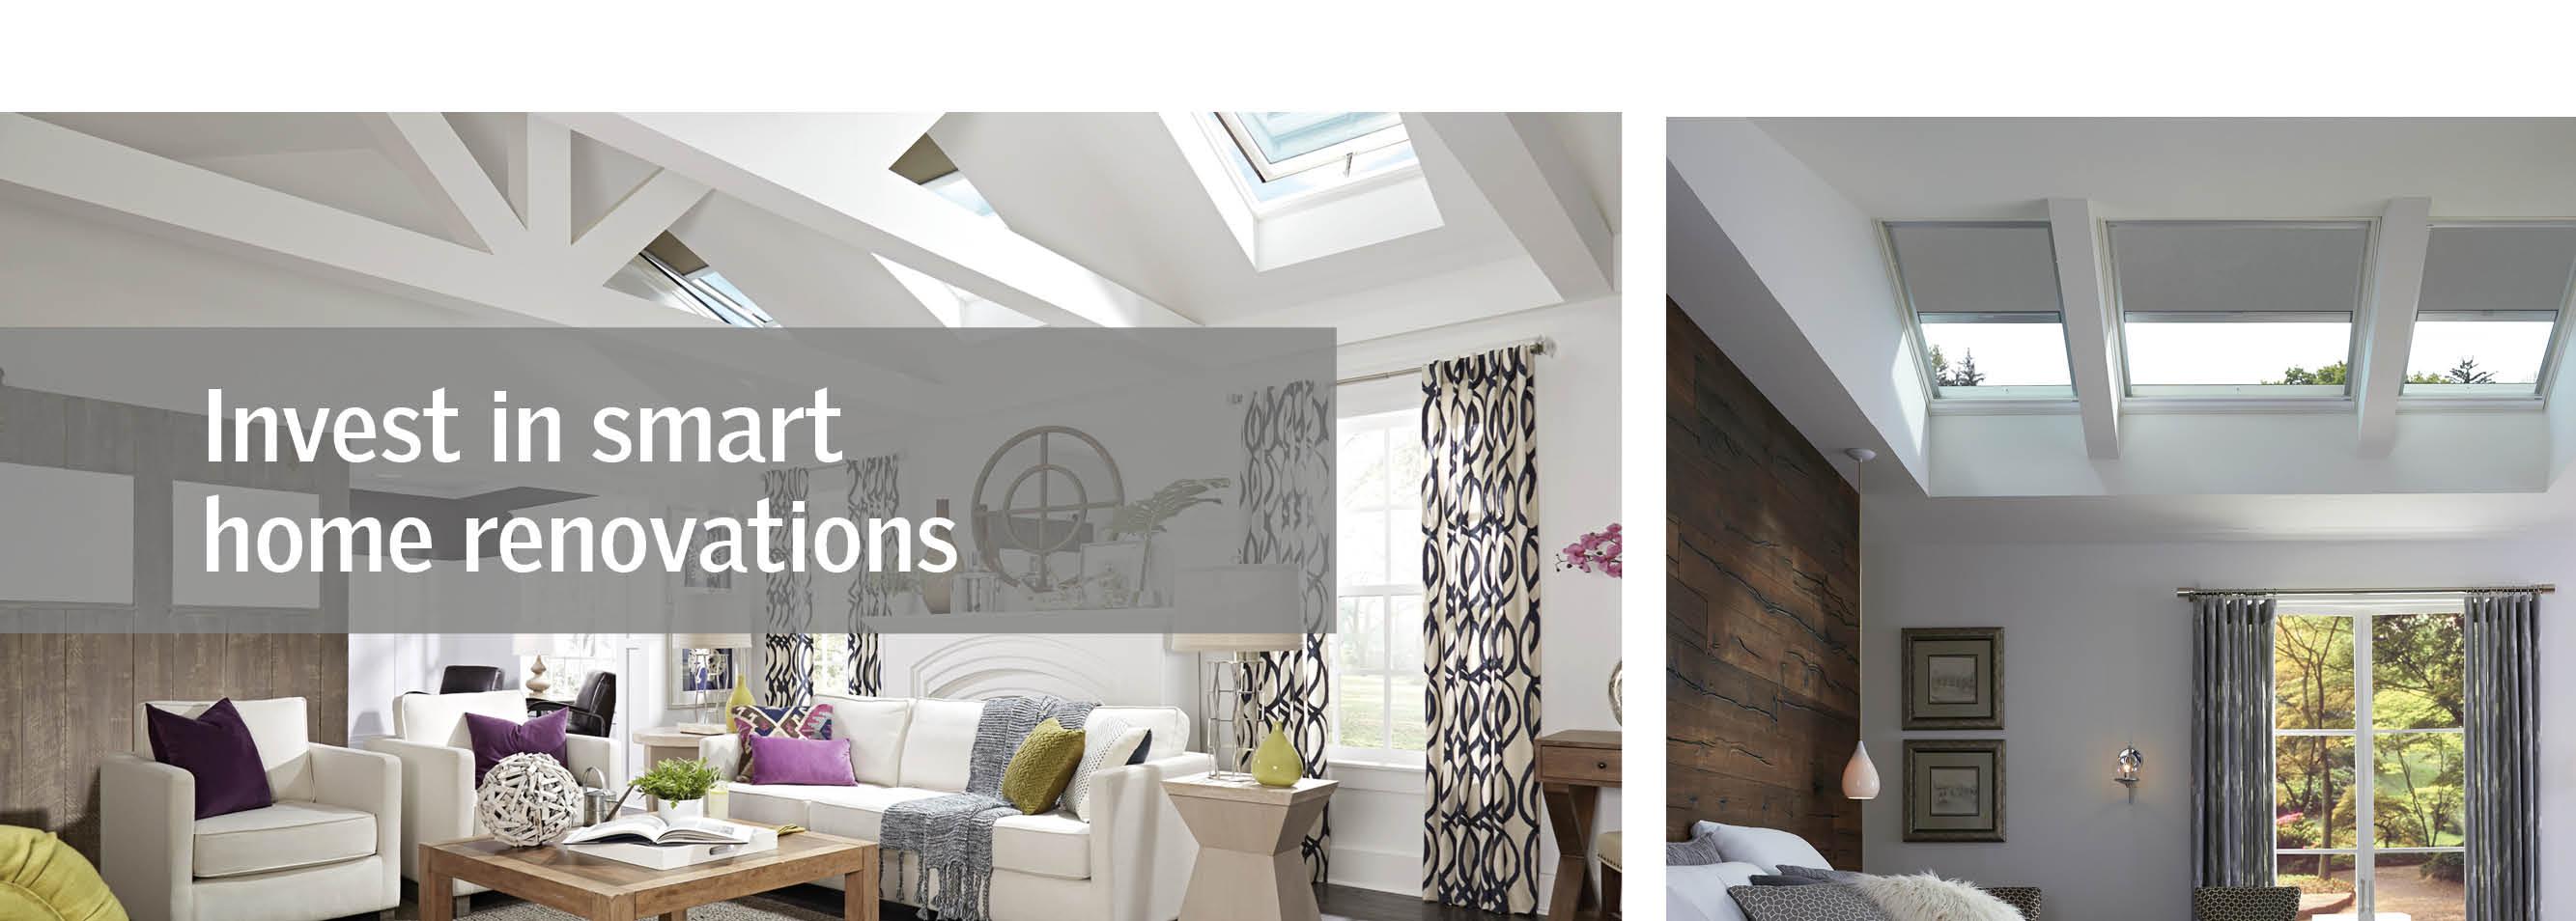 Invest in smart home renovations - Hero-1.jpg